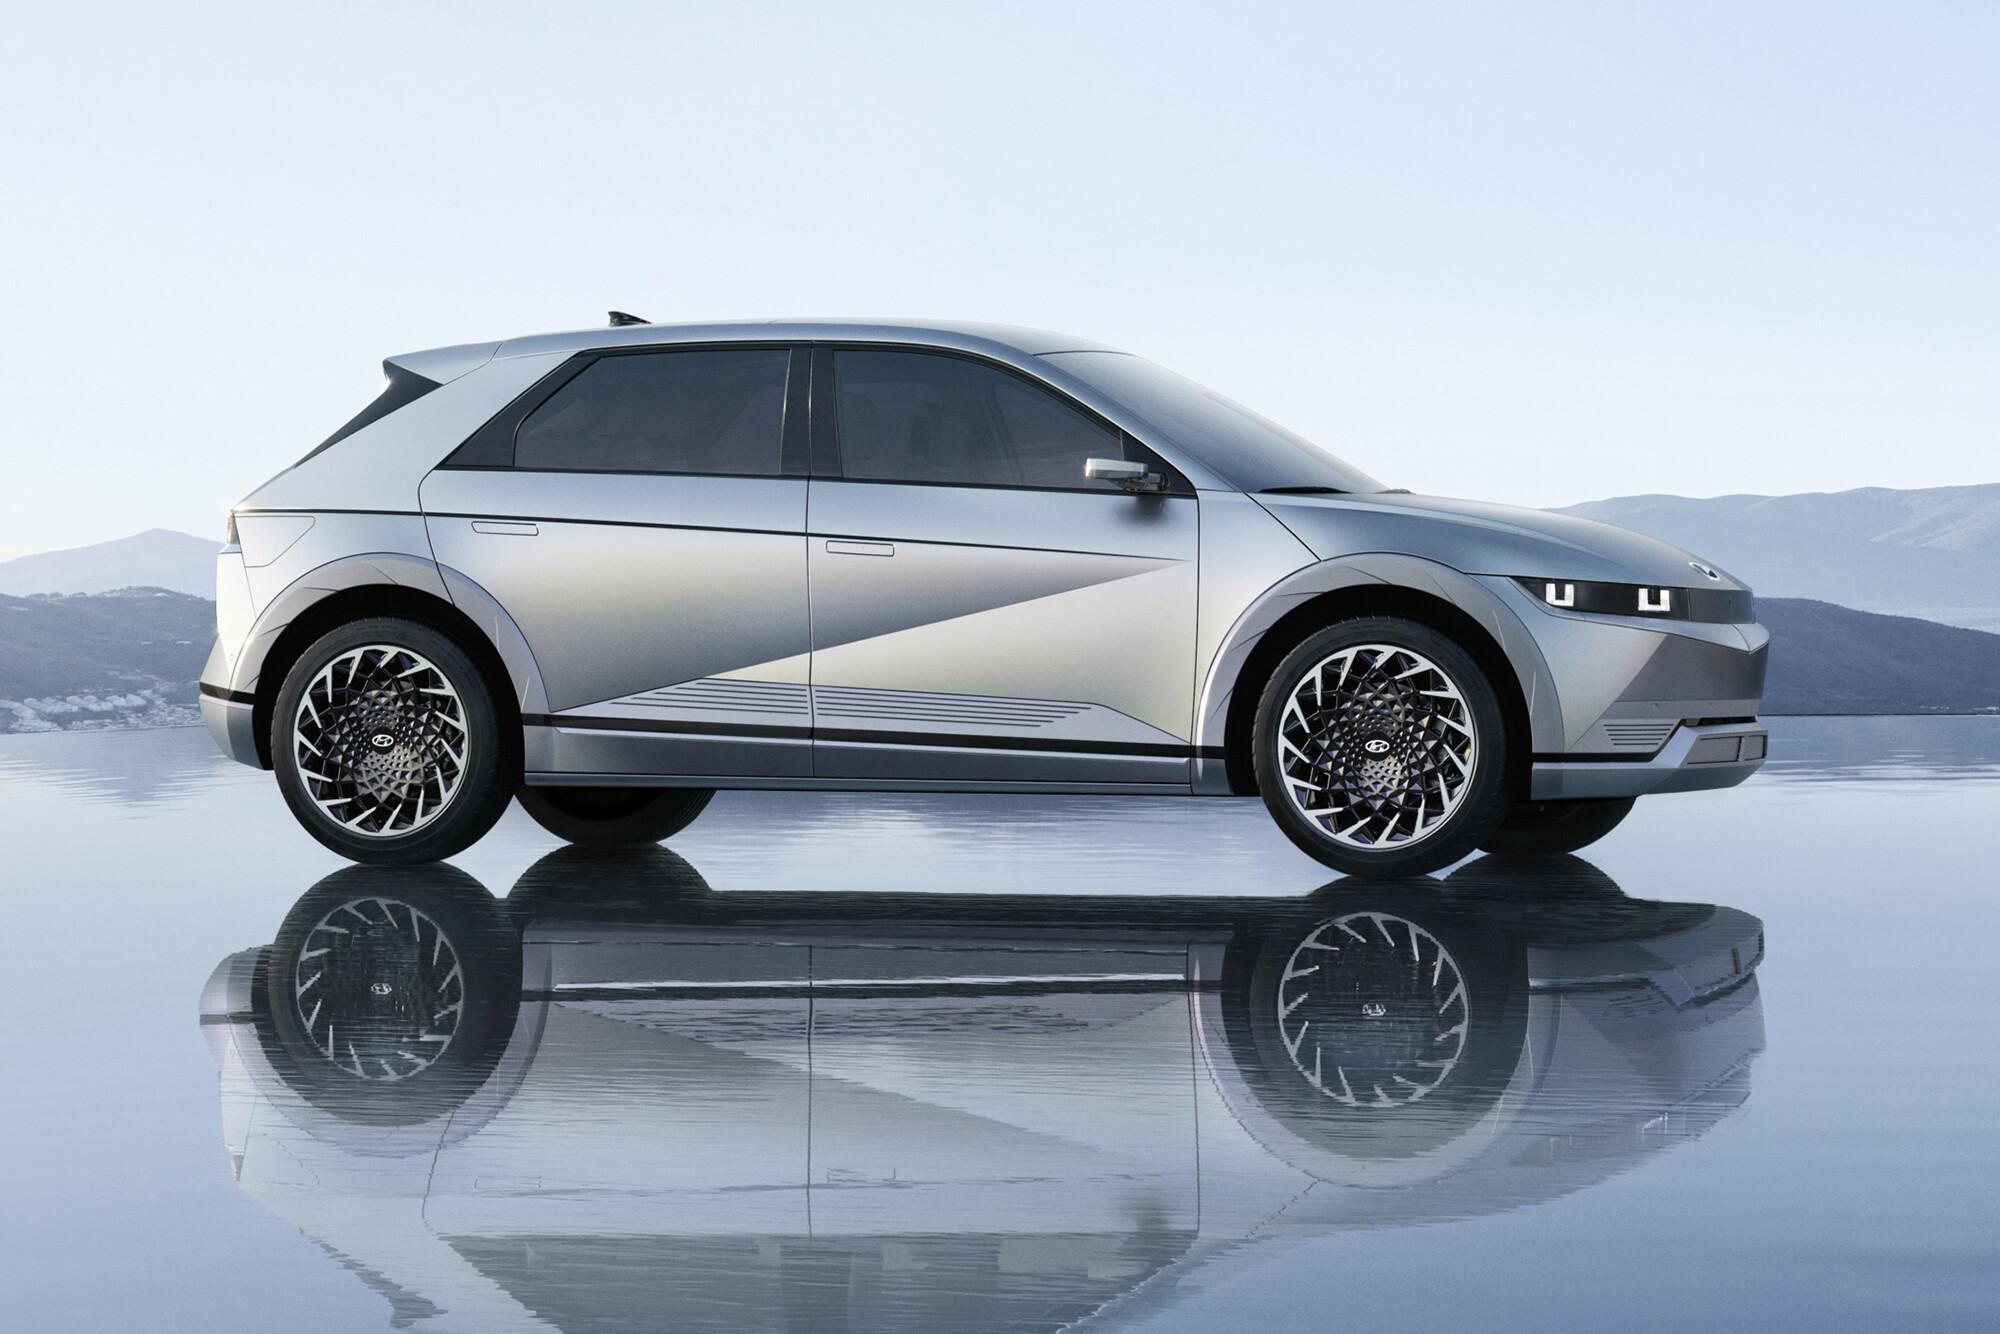 2022 Hyundai Ioniq 5 Electric Vehicle Revealed 7 Jpg